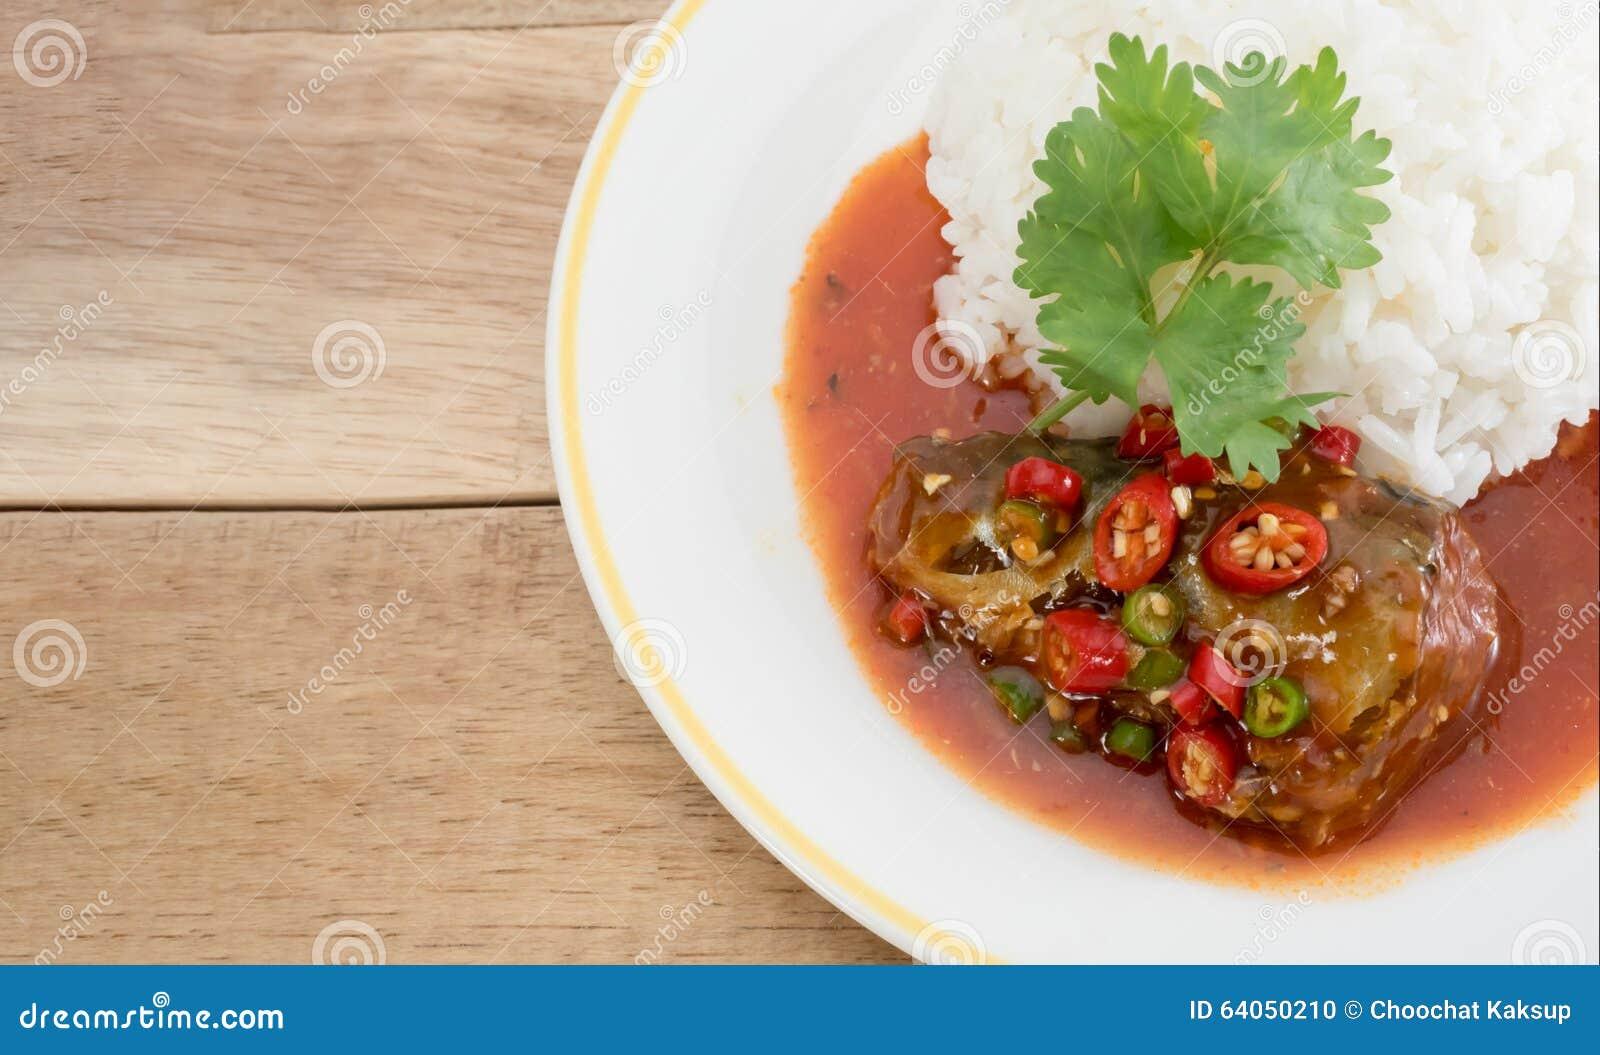 Sardines fish in tomato sauce stock photo image 64050210 for Fish in tomato sauce